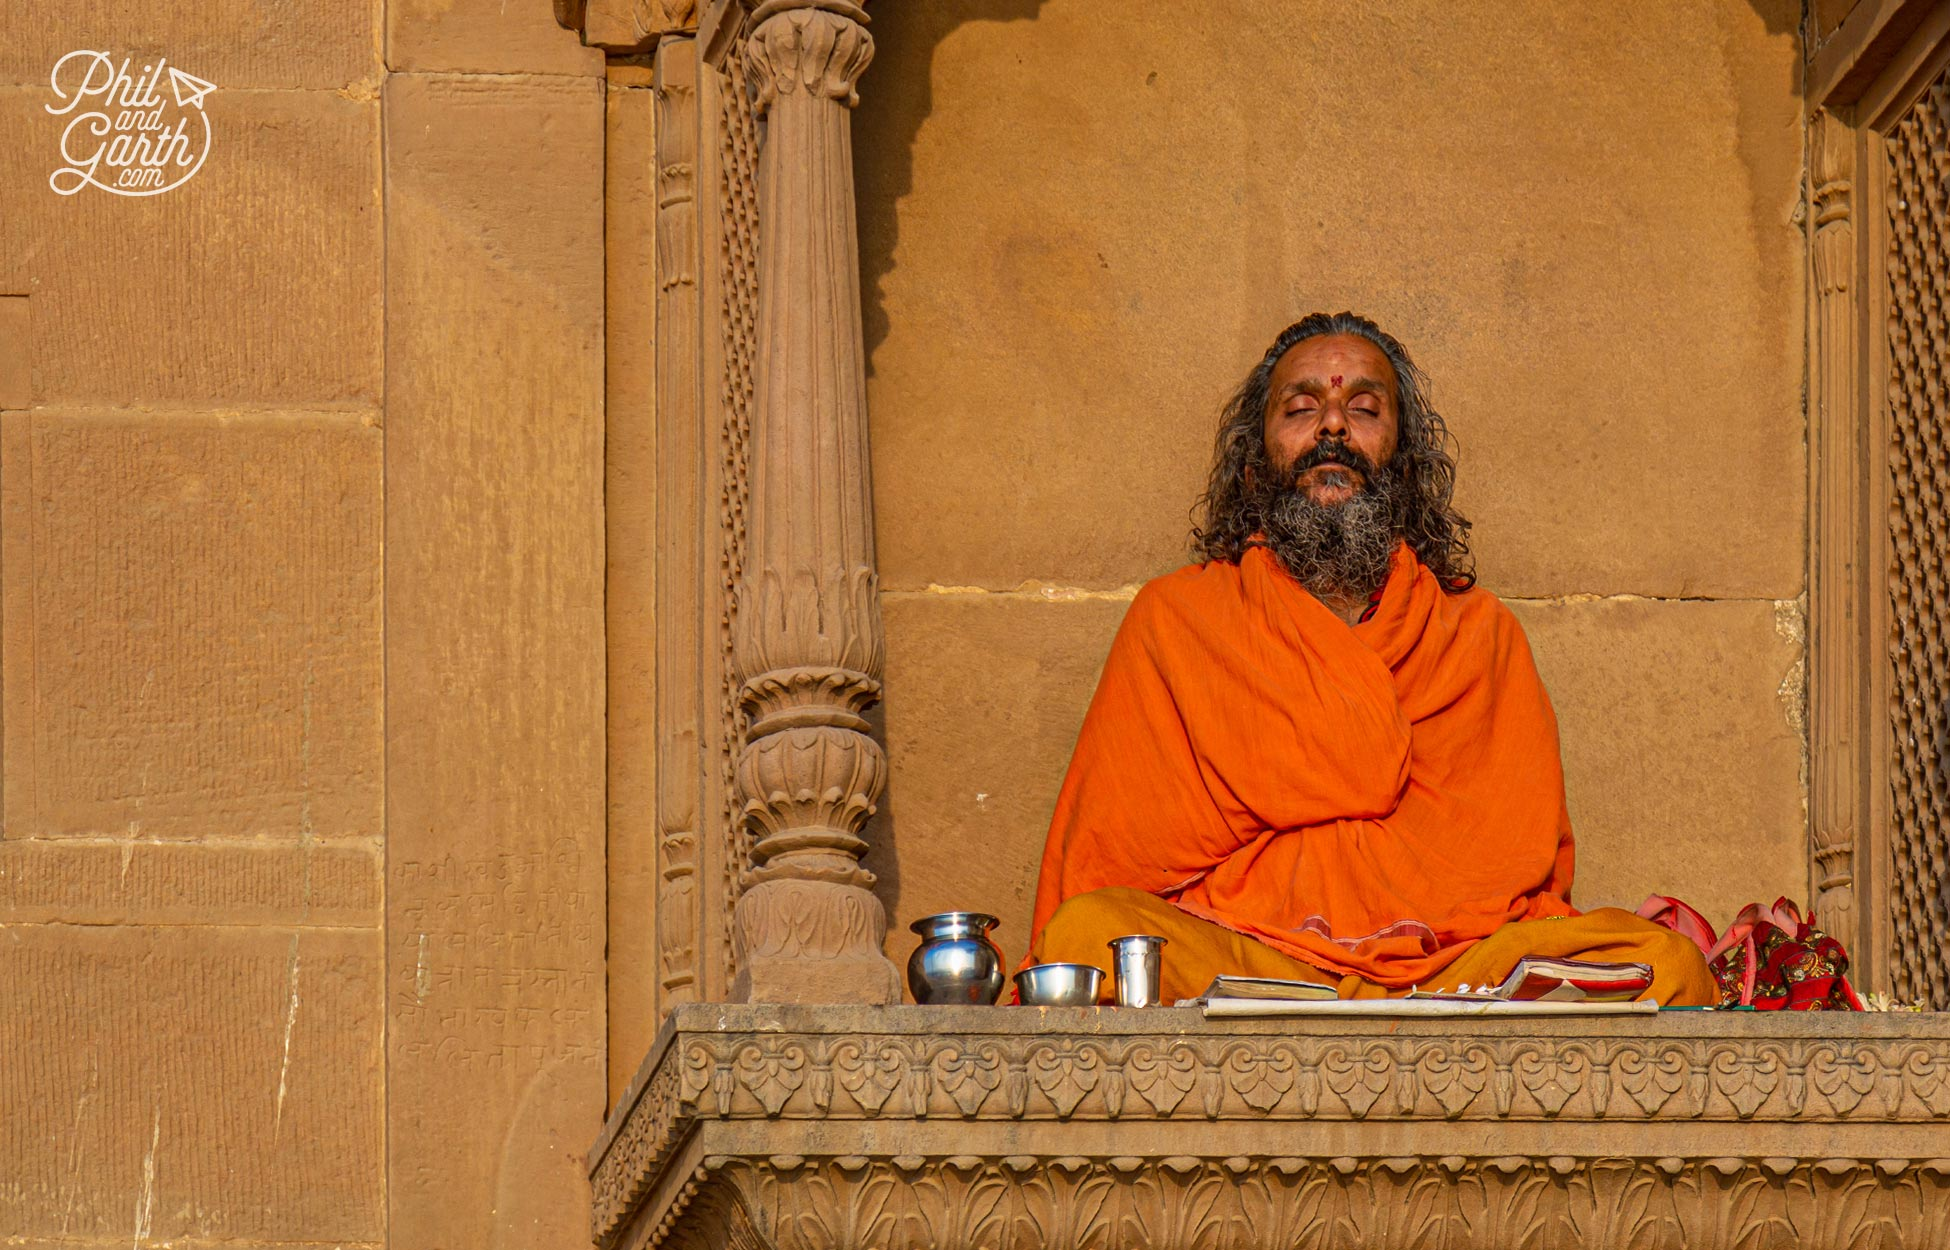 A sadhu meditating next to a temple